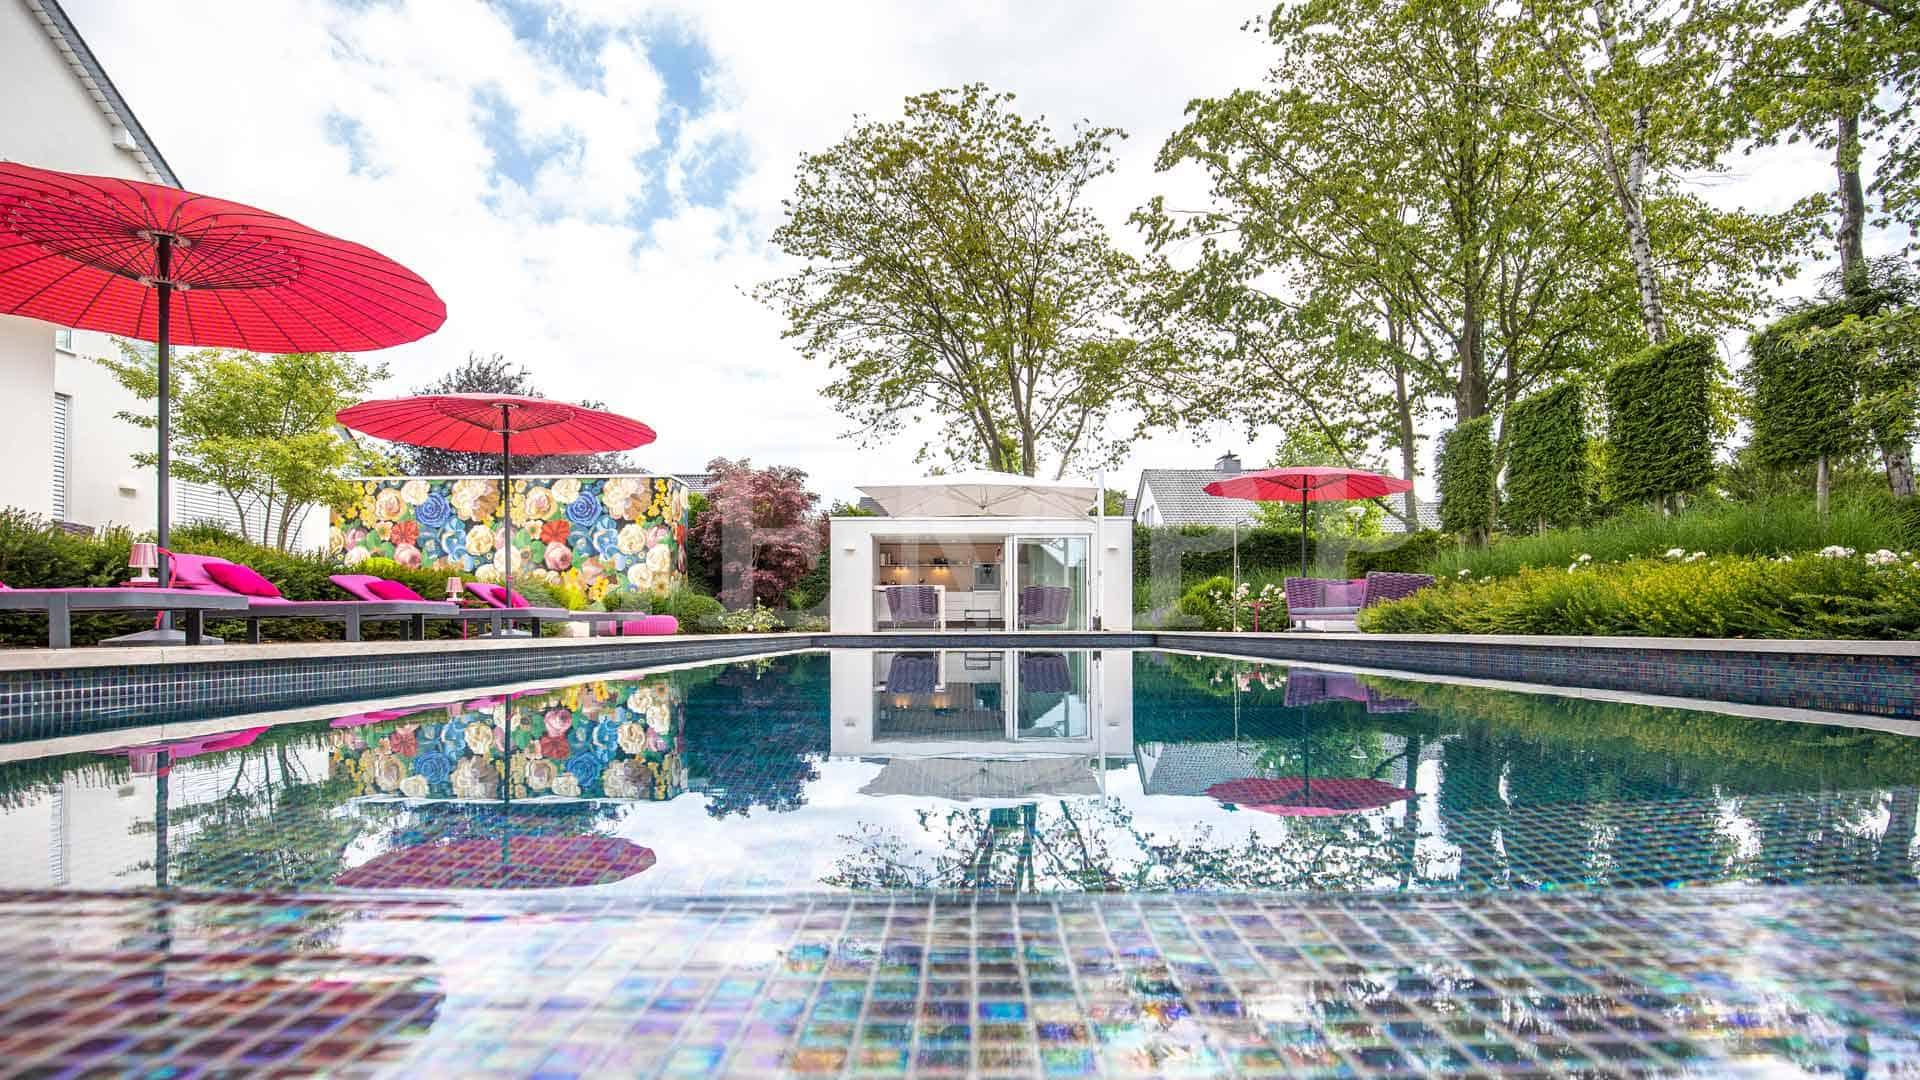 Moderne Gartengestaltung mit Pool Dortmund Düsseldorf Köln